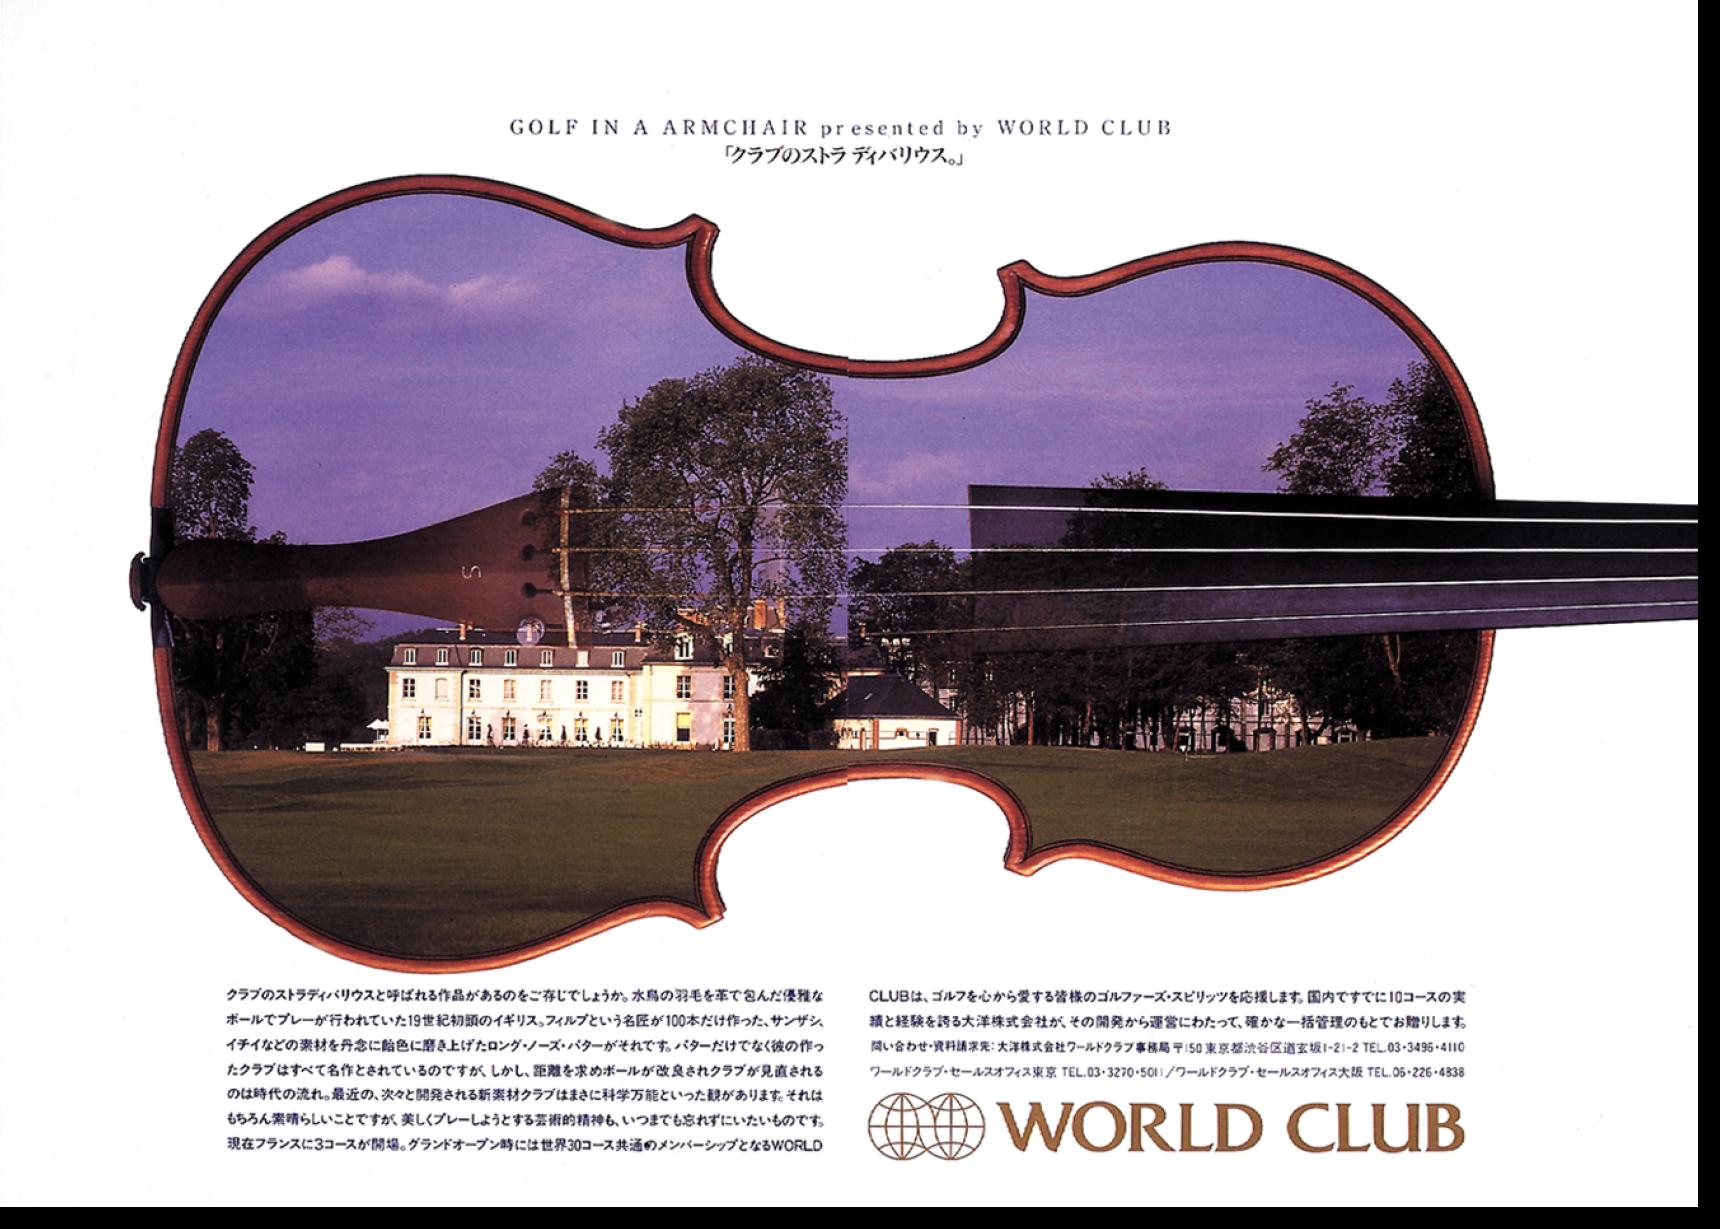 WORLDCLUB